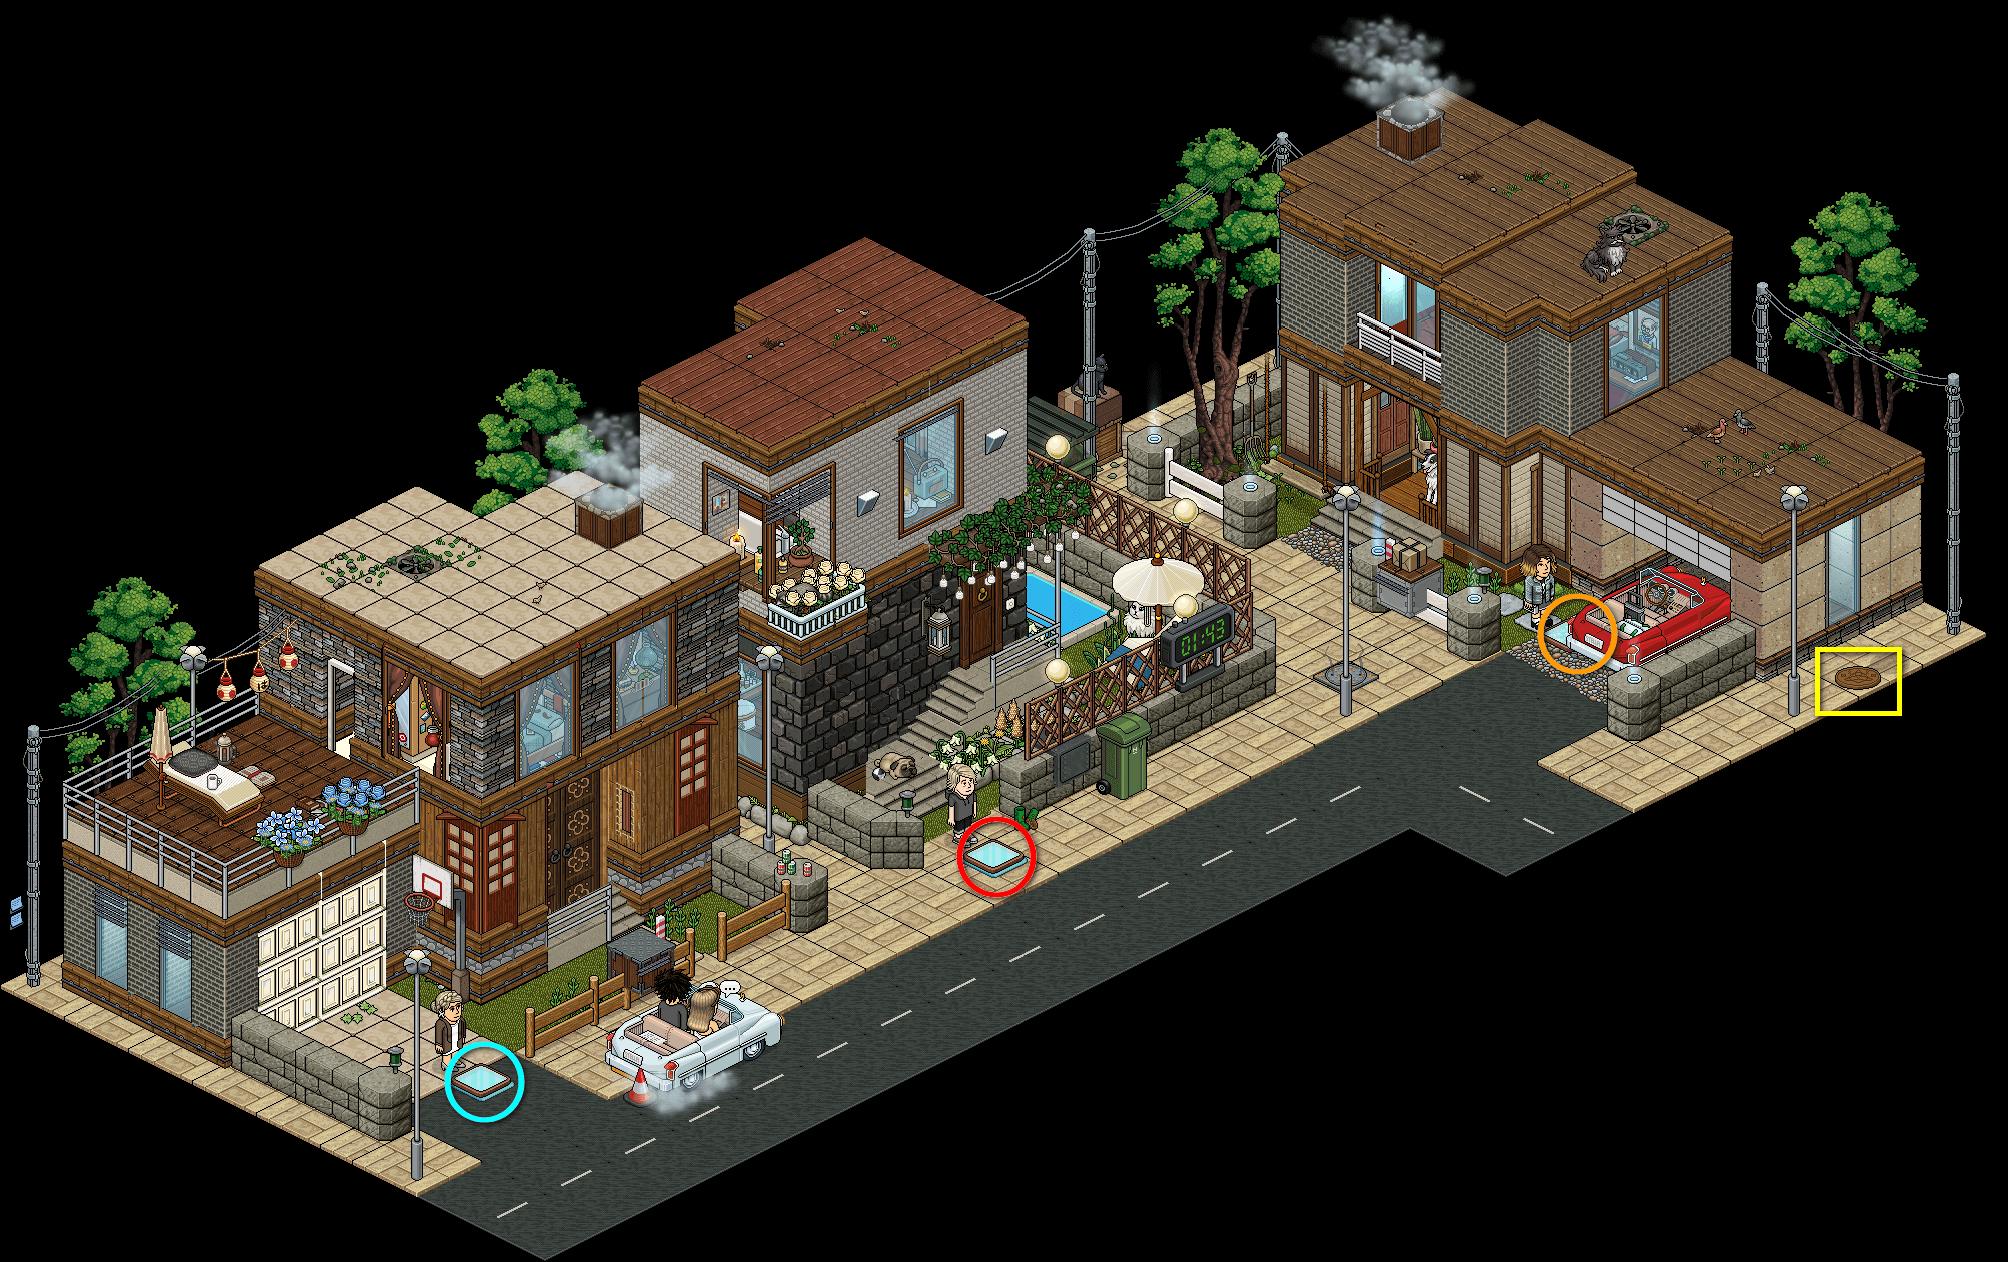 [HS] V.6 - Rue résidentielle